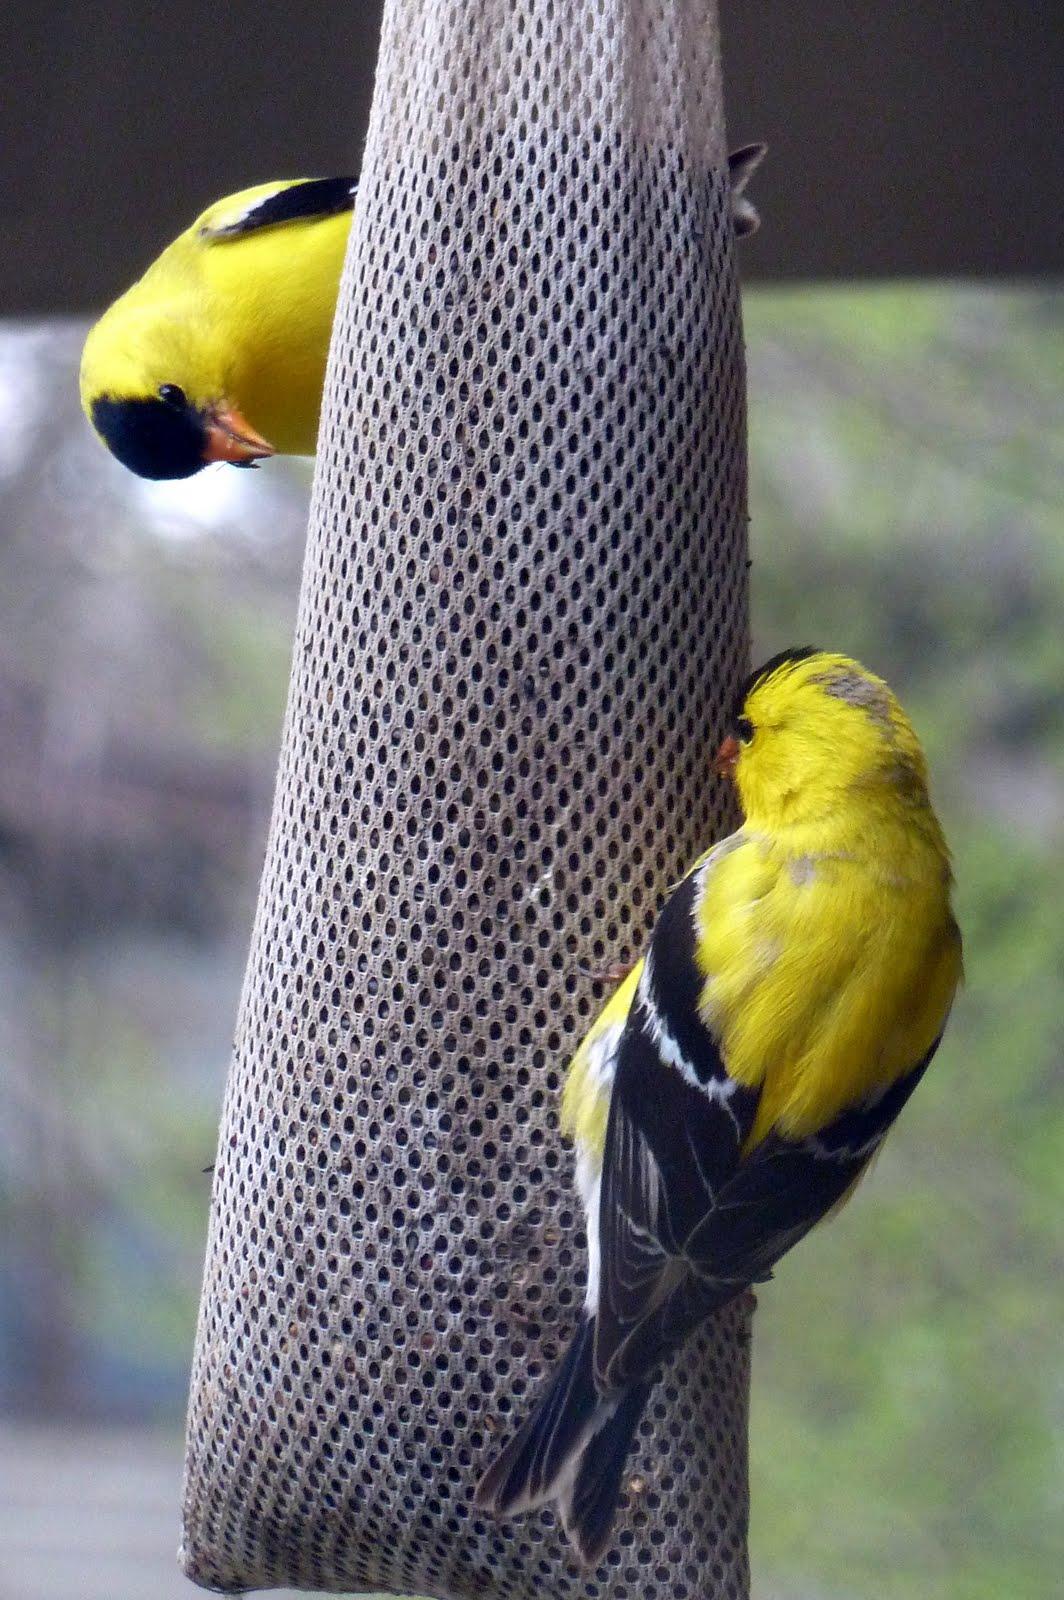 red tutorial easy diy feeders yellow feeder bird nine